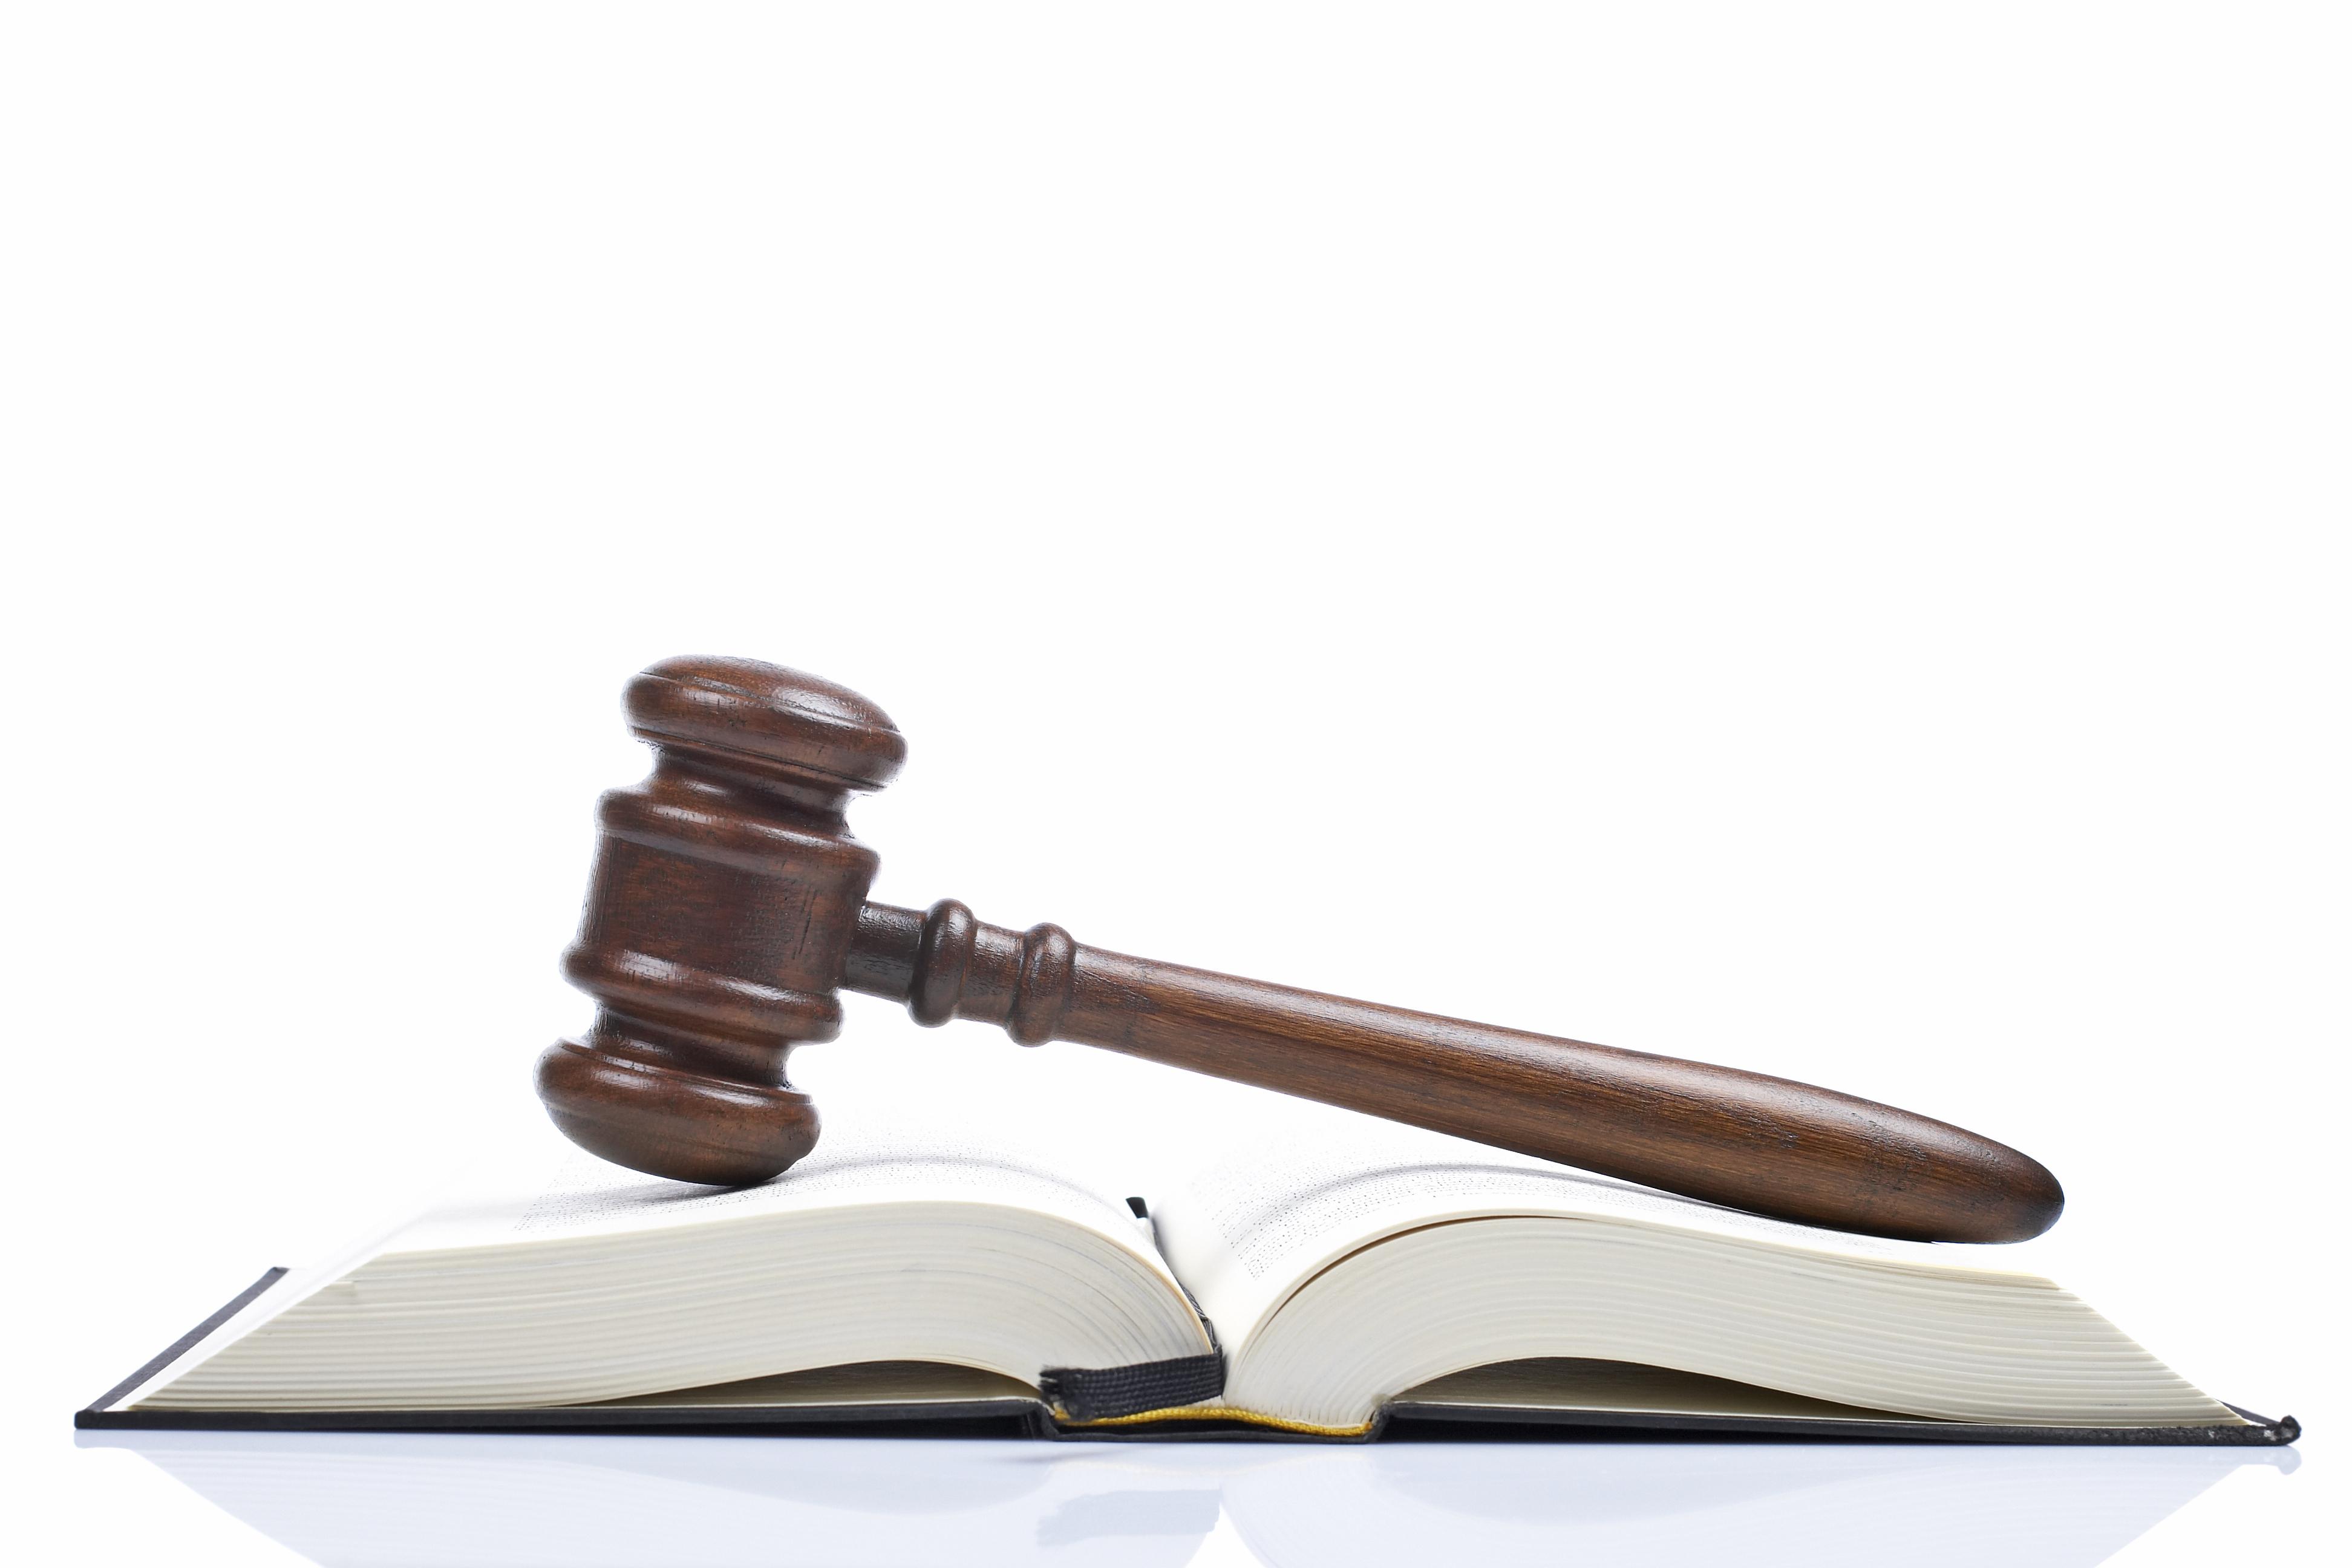 legal issues team surfrider foundation